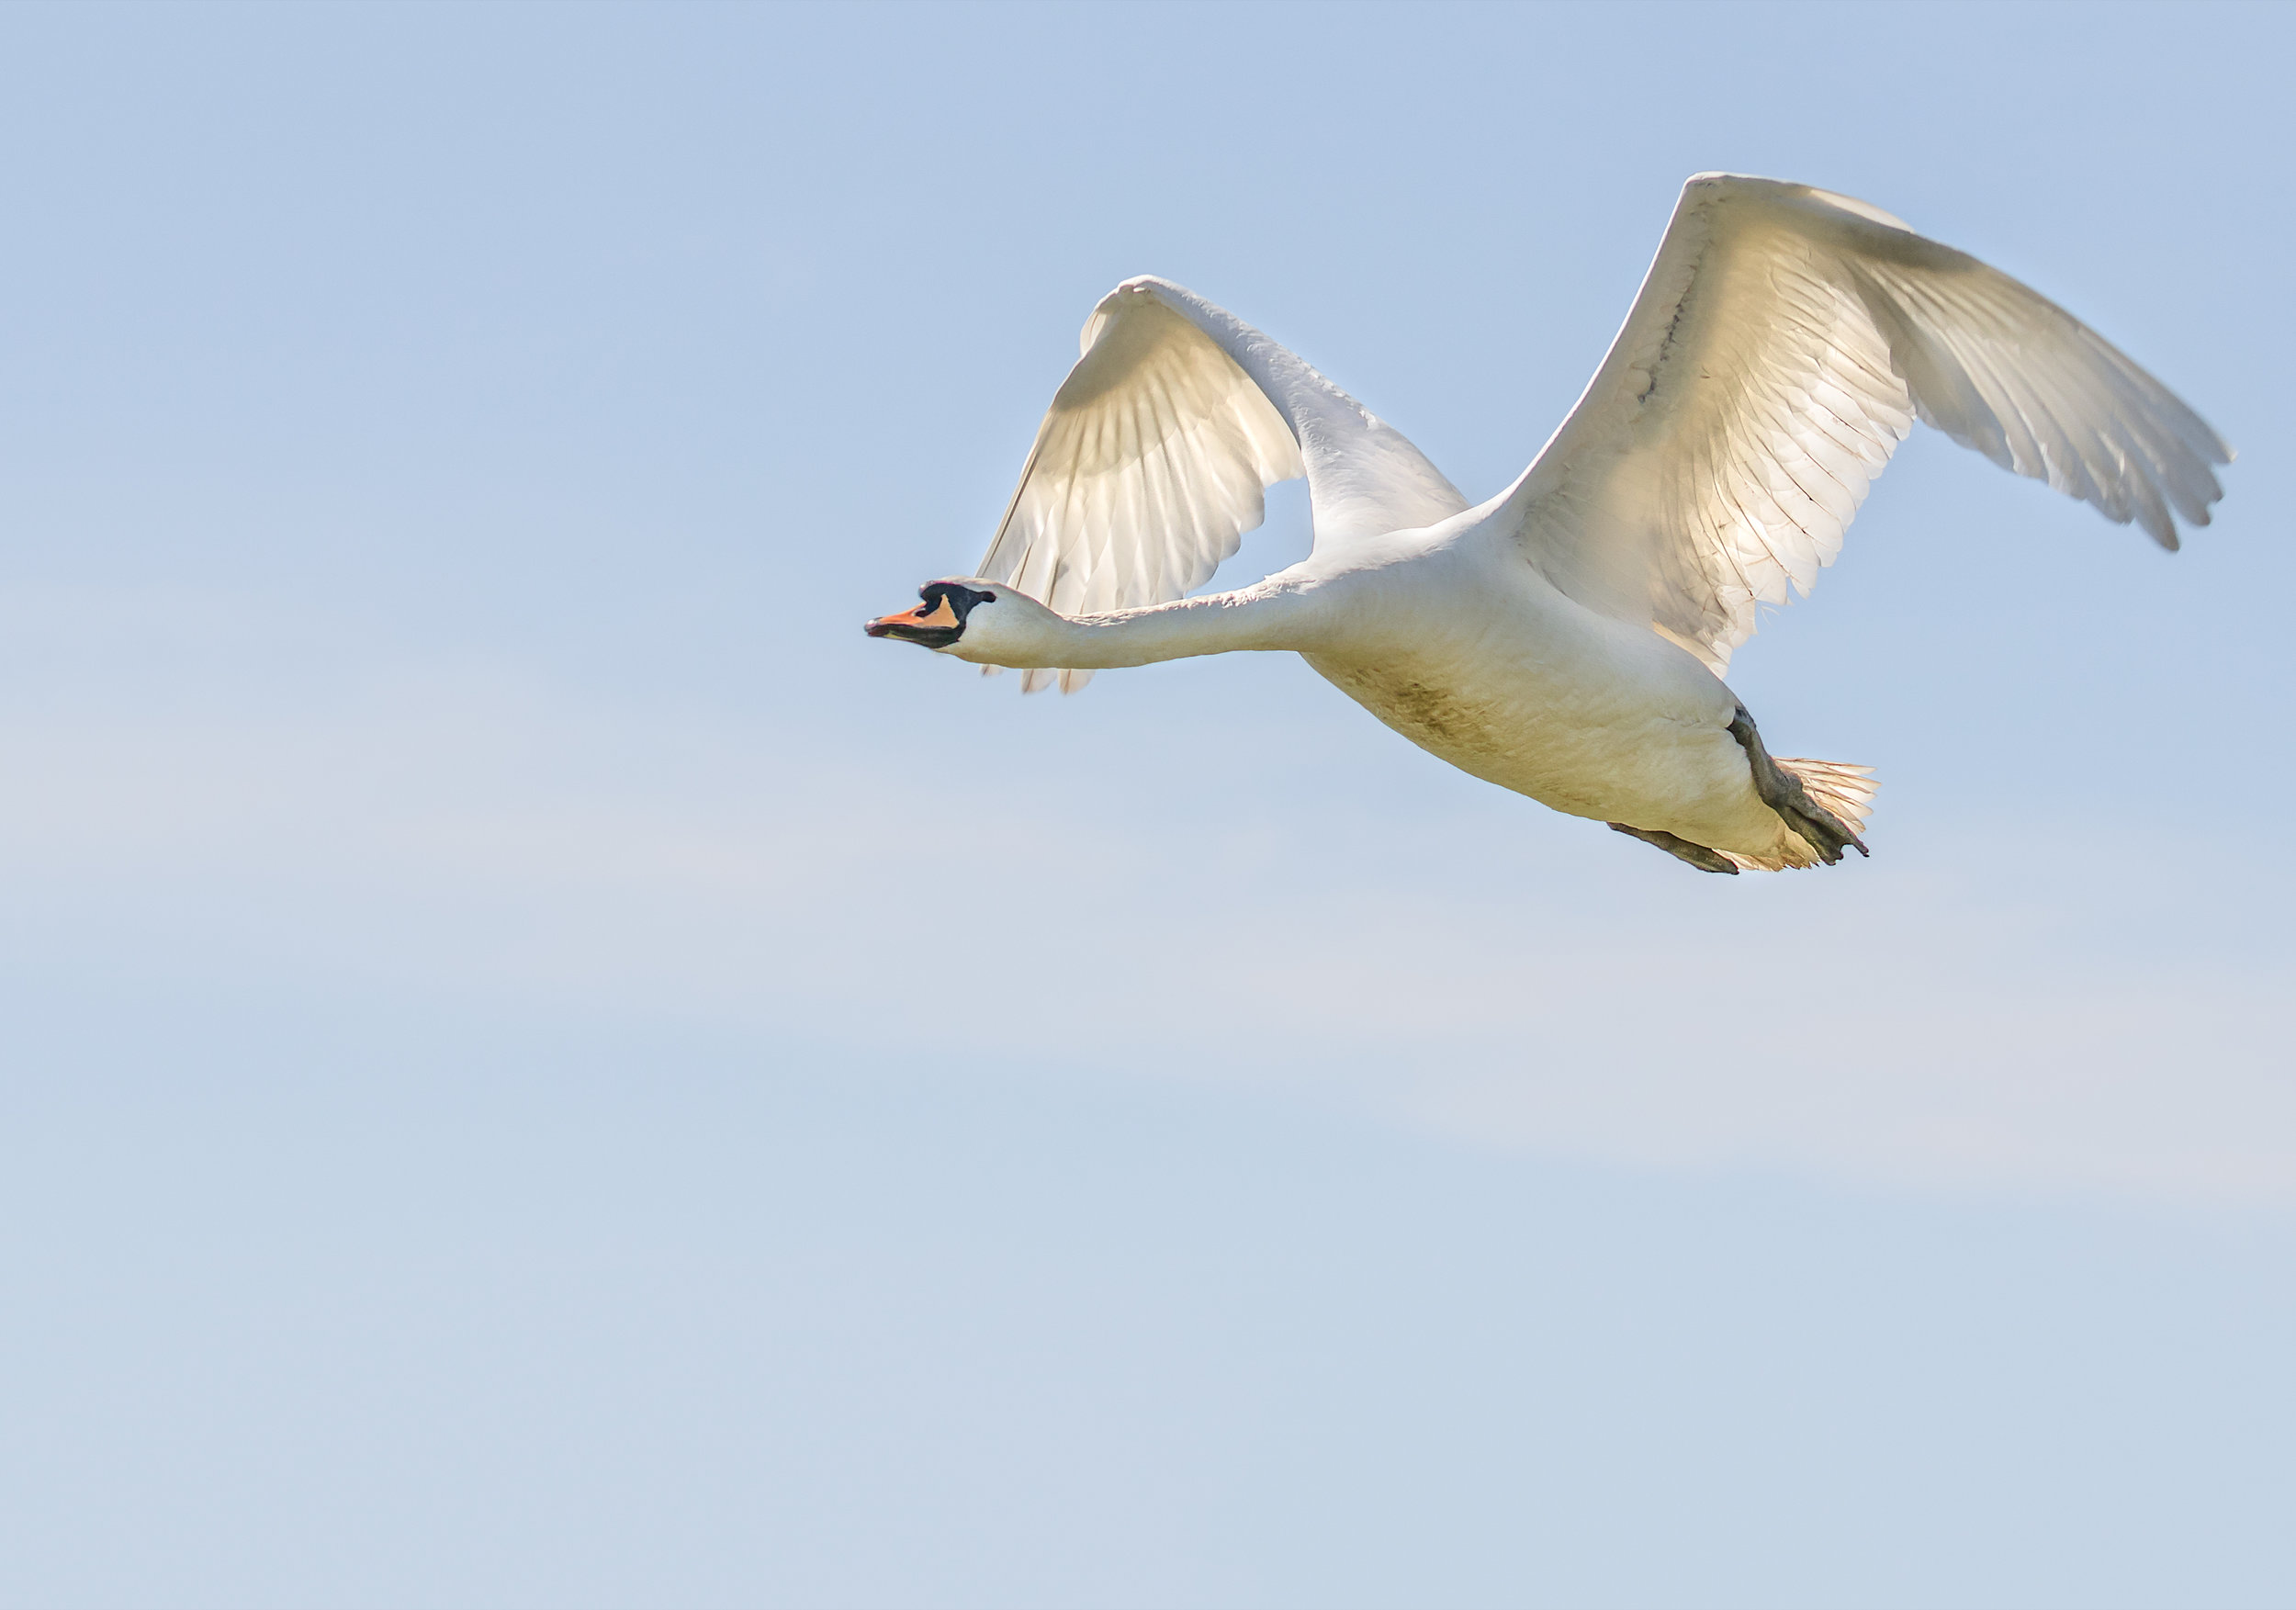 Swan flight in the winter sunlight